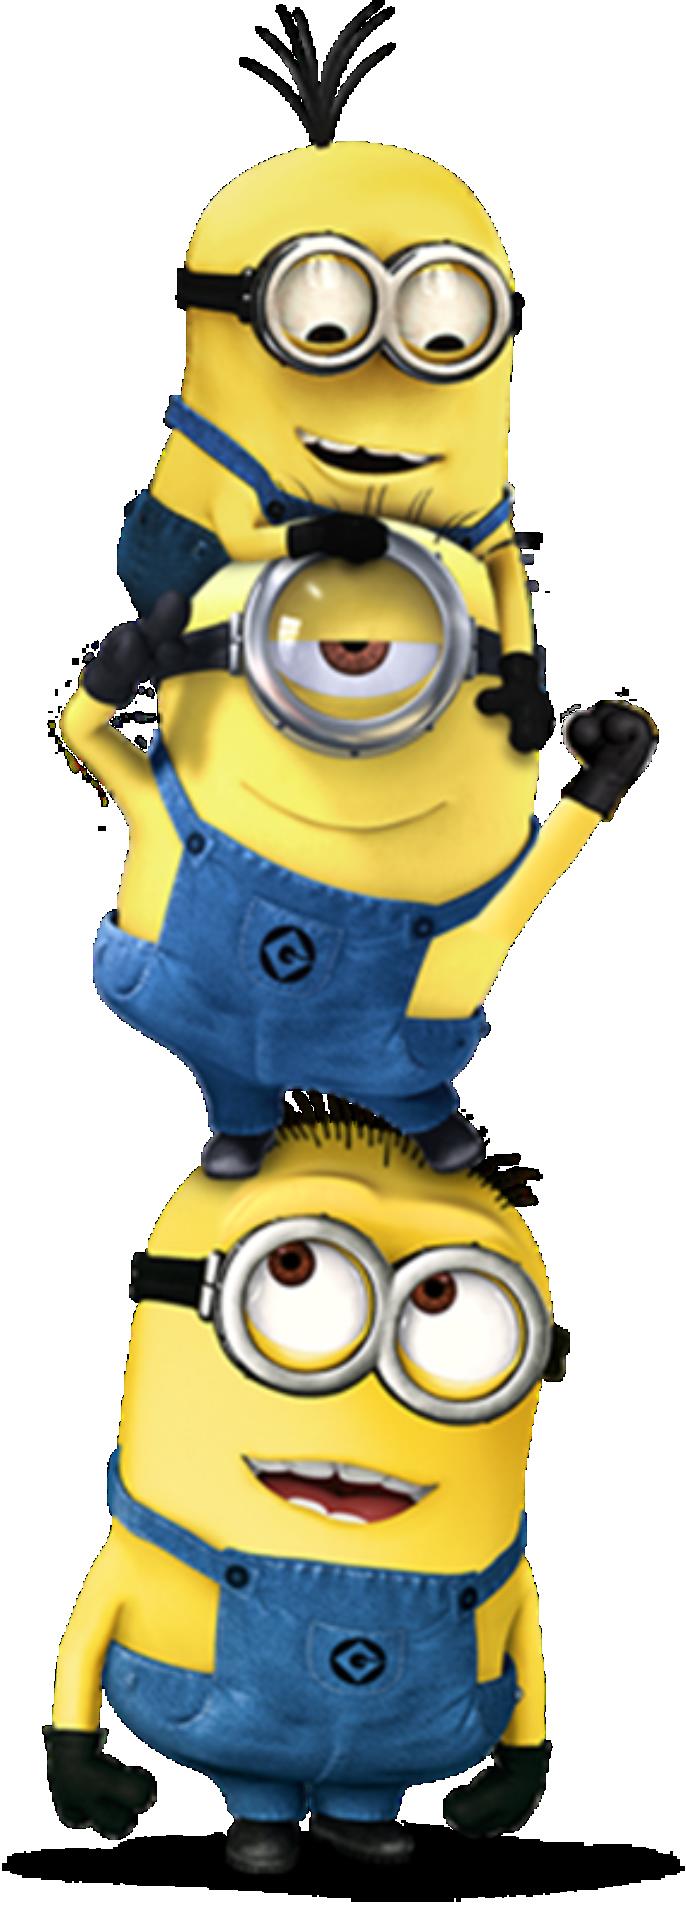 evil favorite – minions, favorito del mal – minions, böser Favorit - Günstlinge